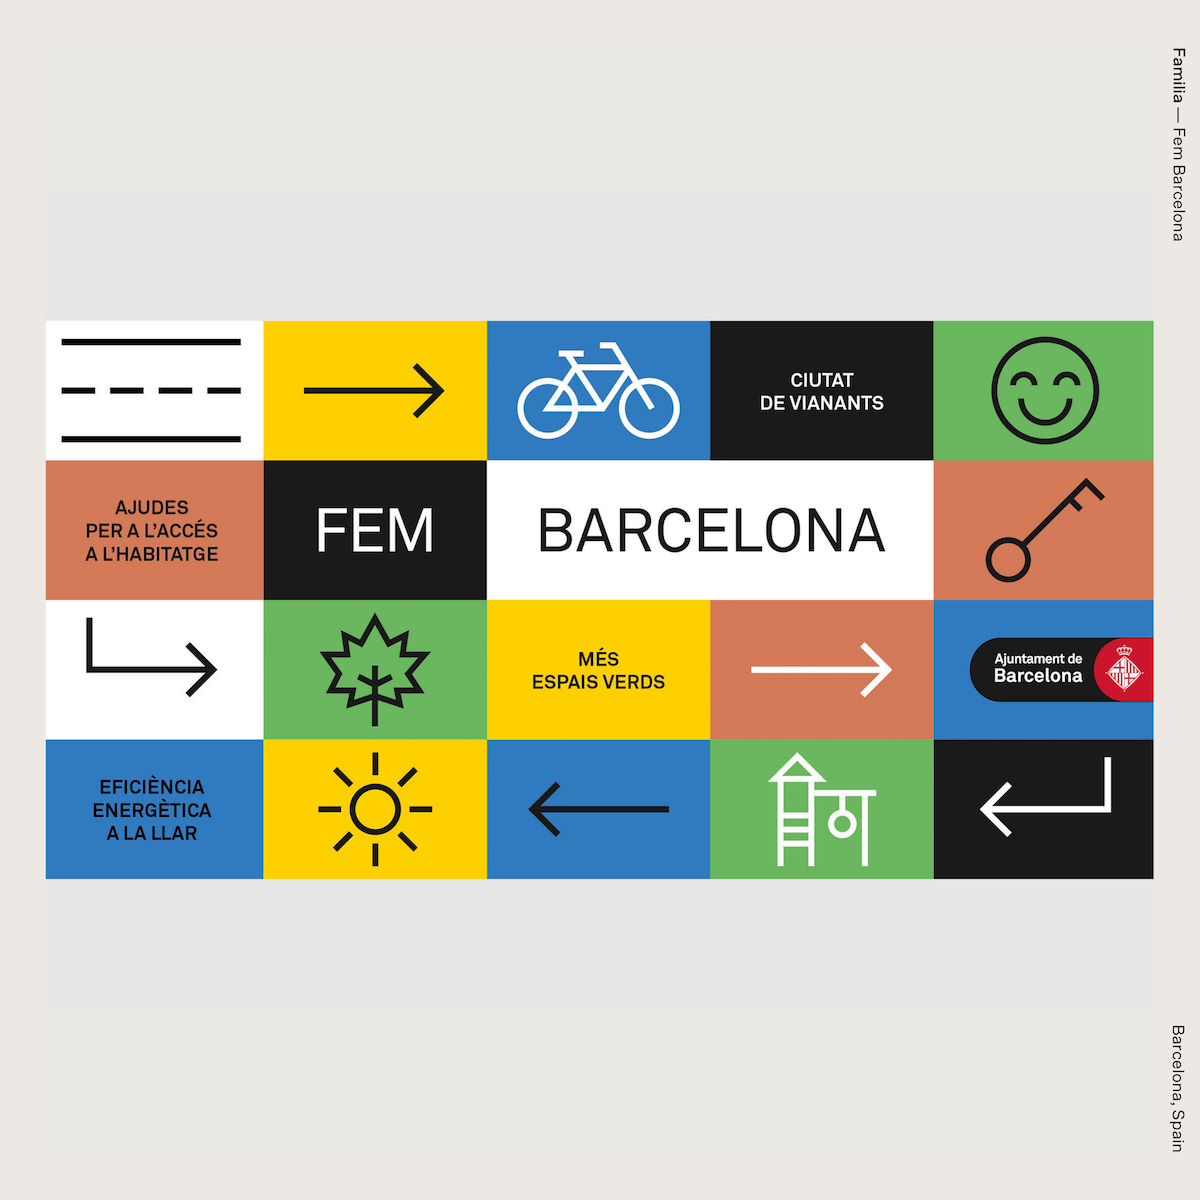 Familia — Fem Barcelona